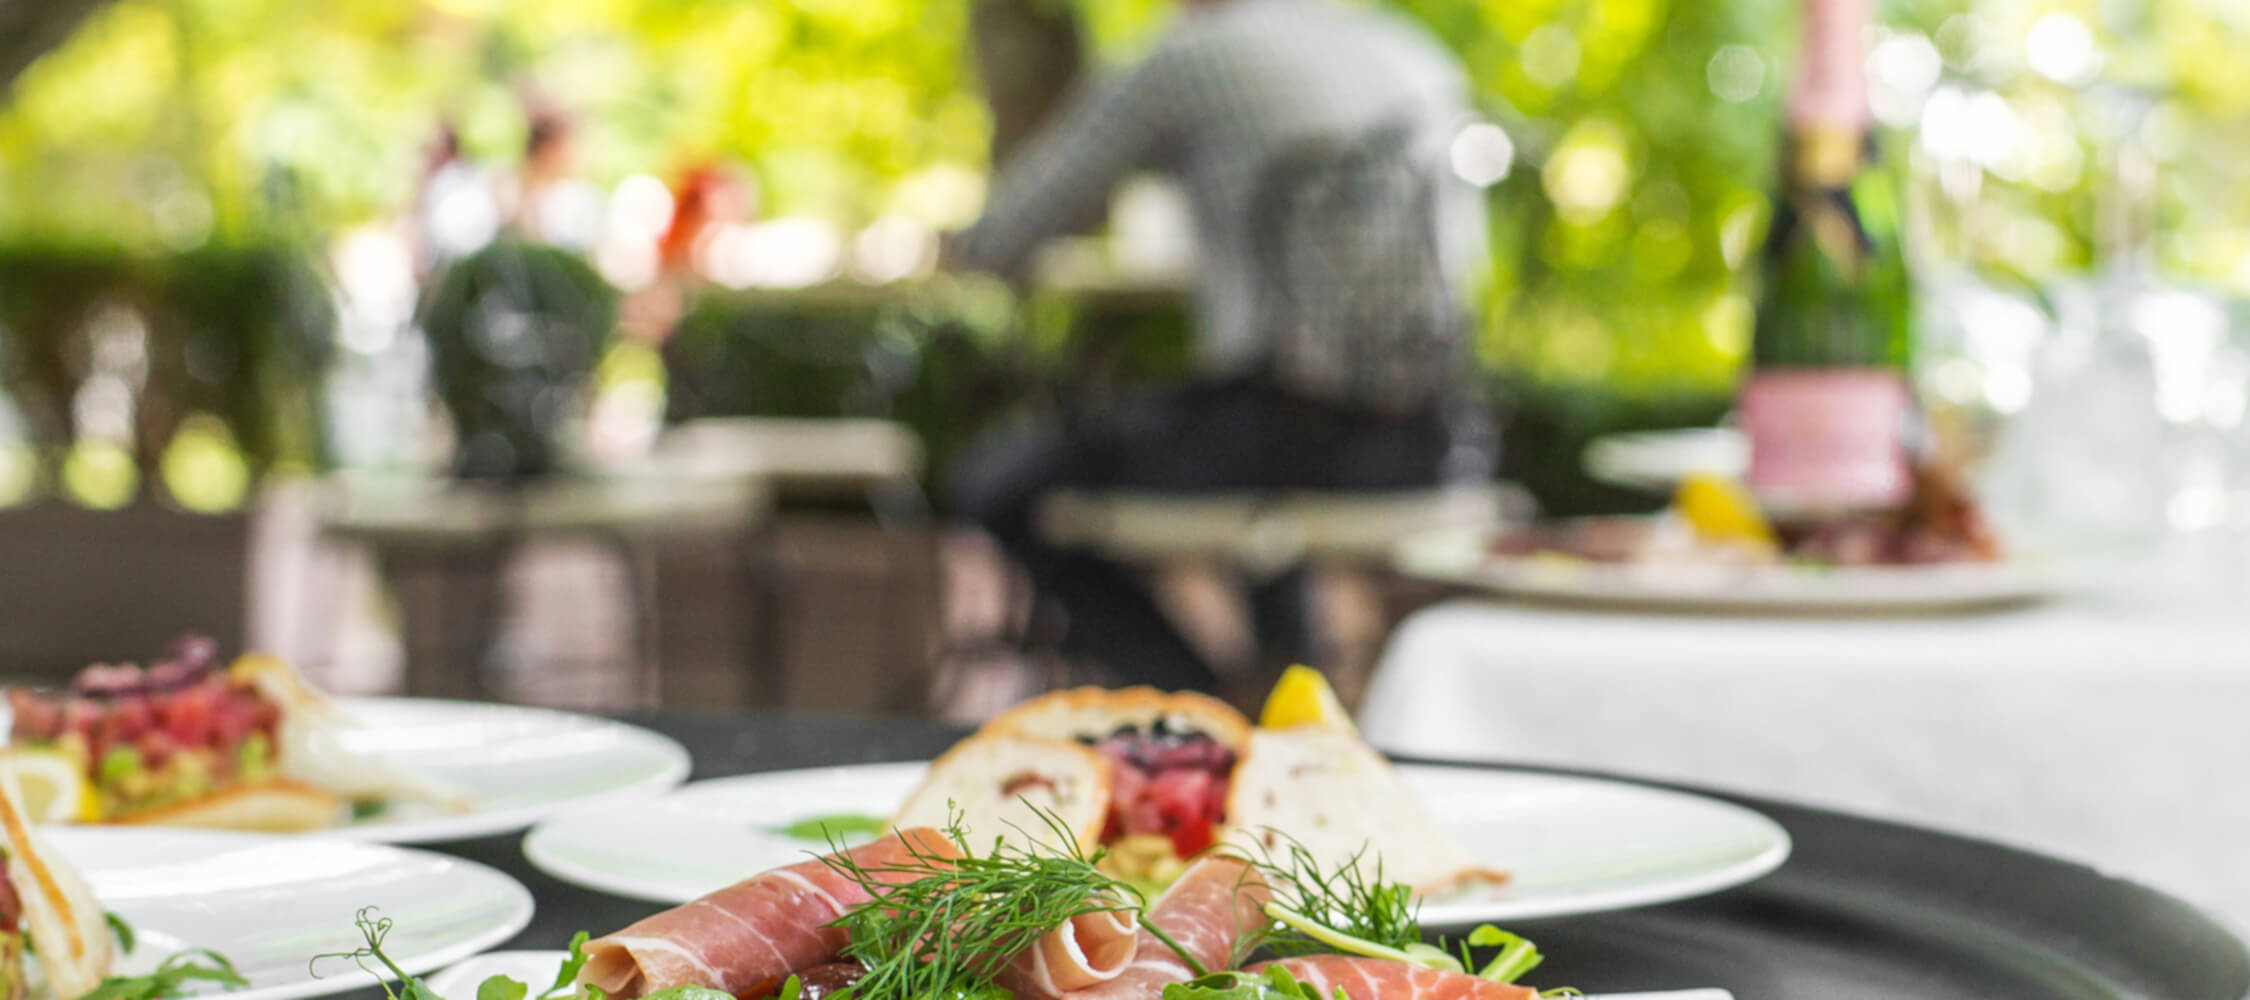 Hotel-Villa-Laurus-Merano-Restaurant-Breakfast-Buffet-Fruehstueck-Essen-Garten-Terrasse-144107112_L-2250x1000